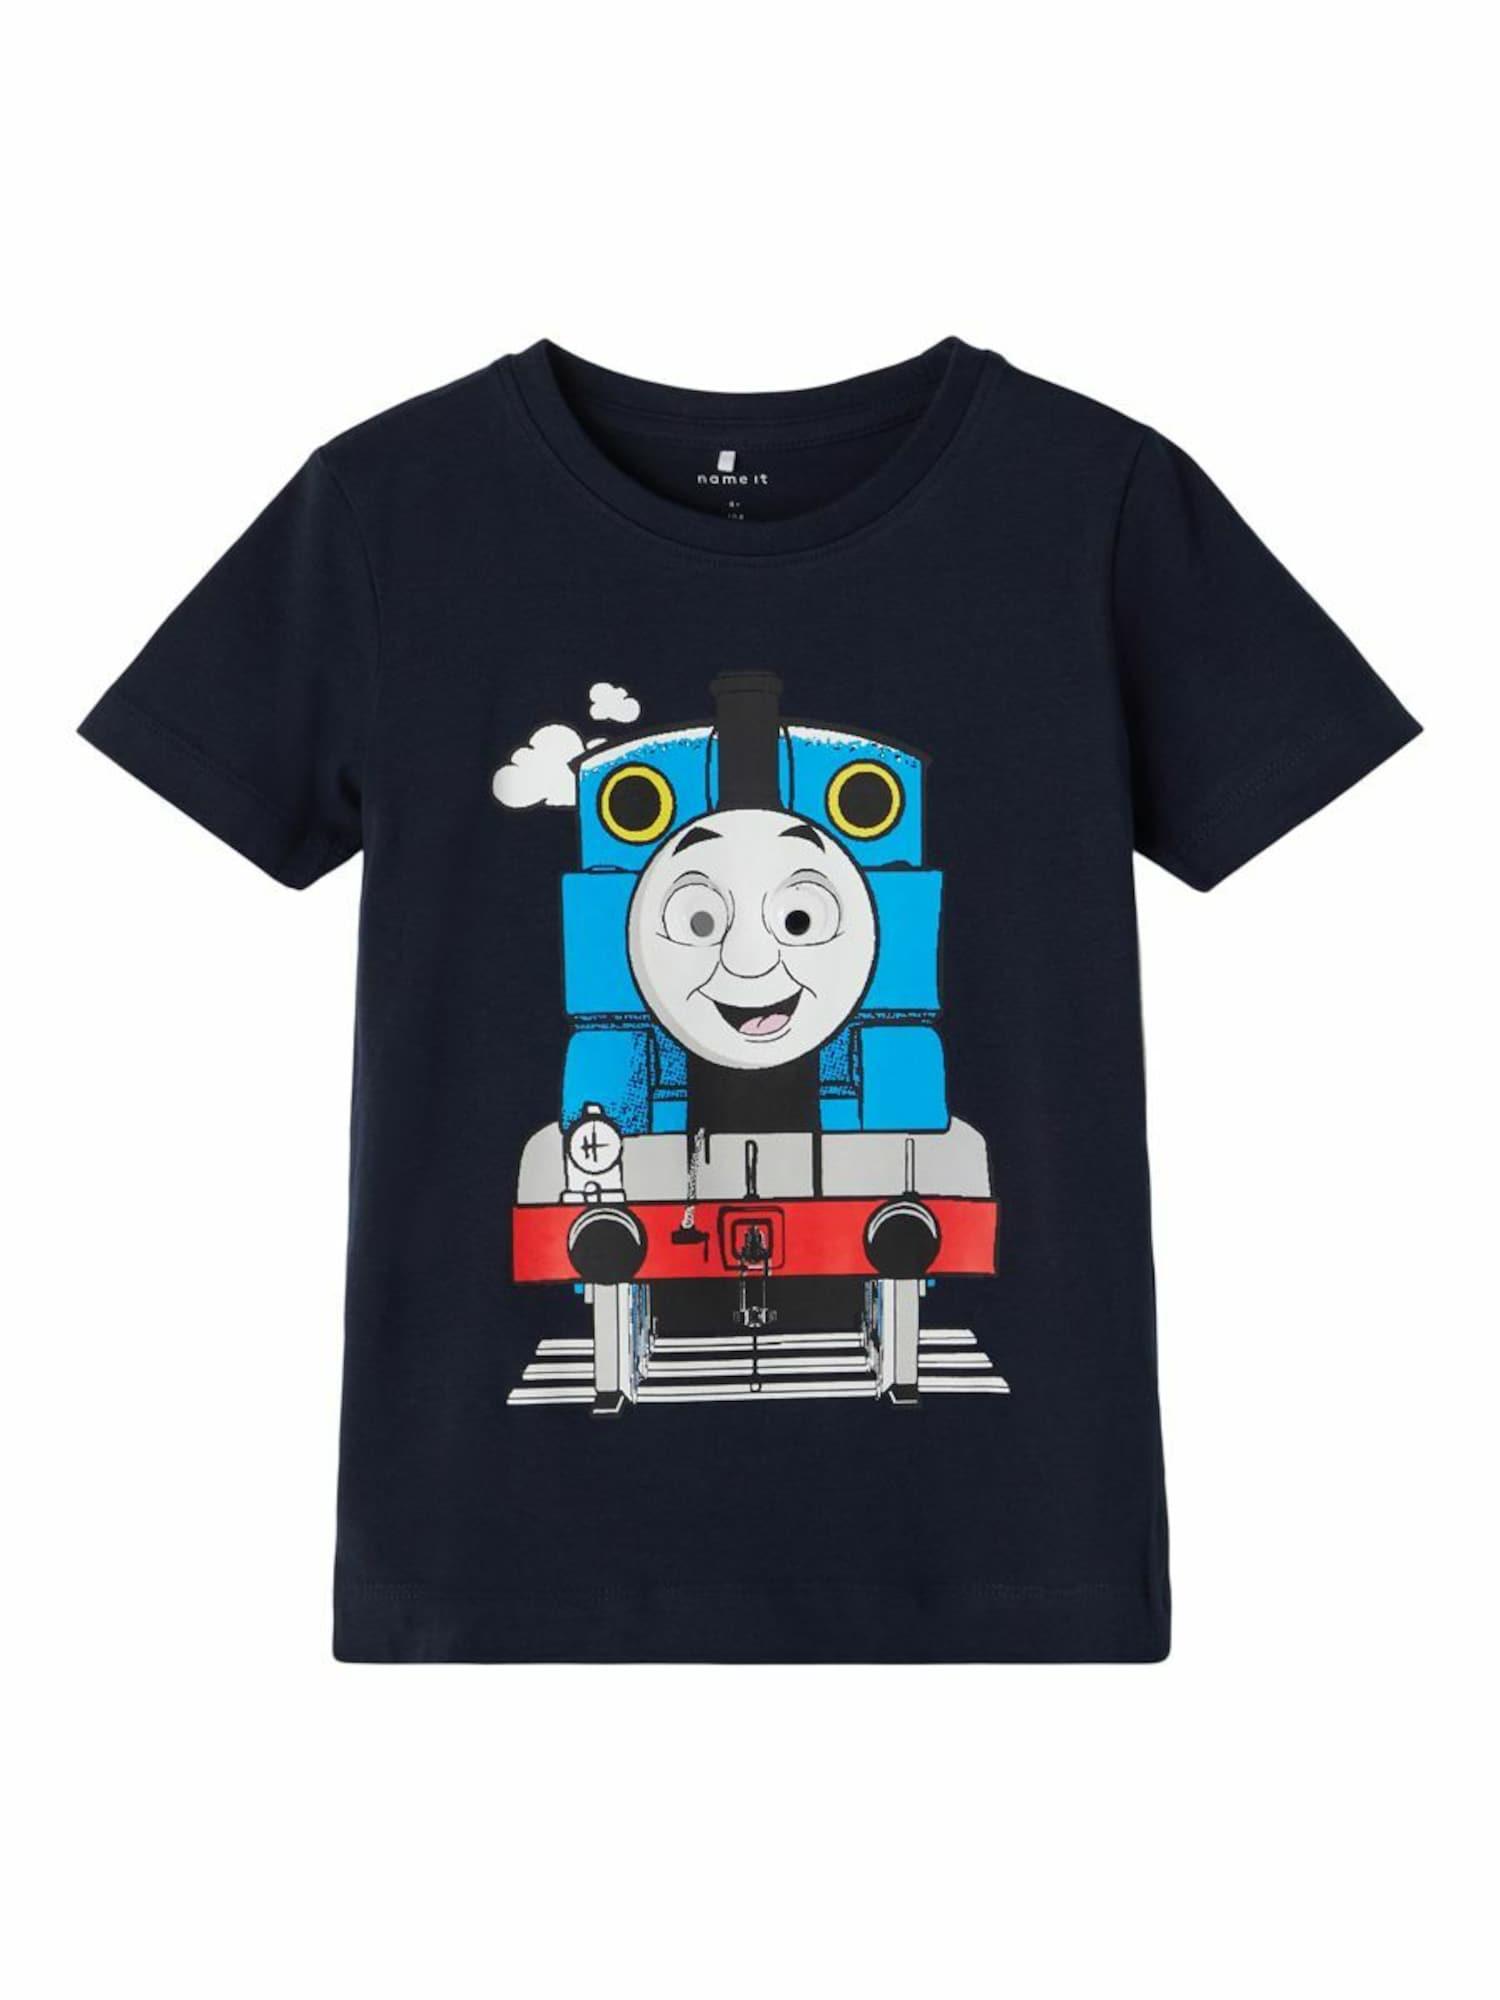 NAME IT T-Shirt 'Thomas Train'  - Bleu - Taille: 92 - boy